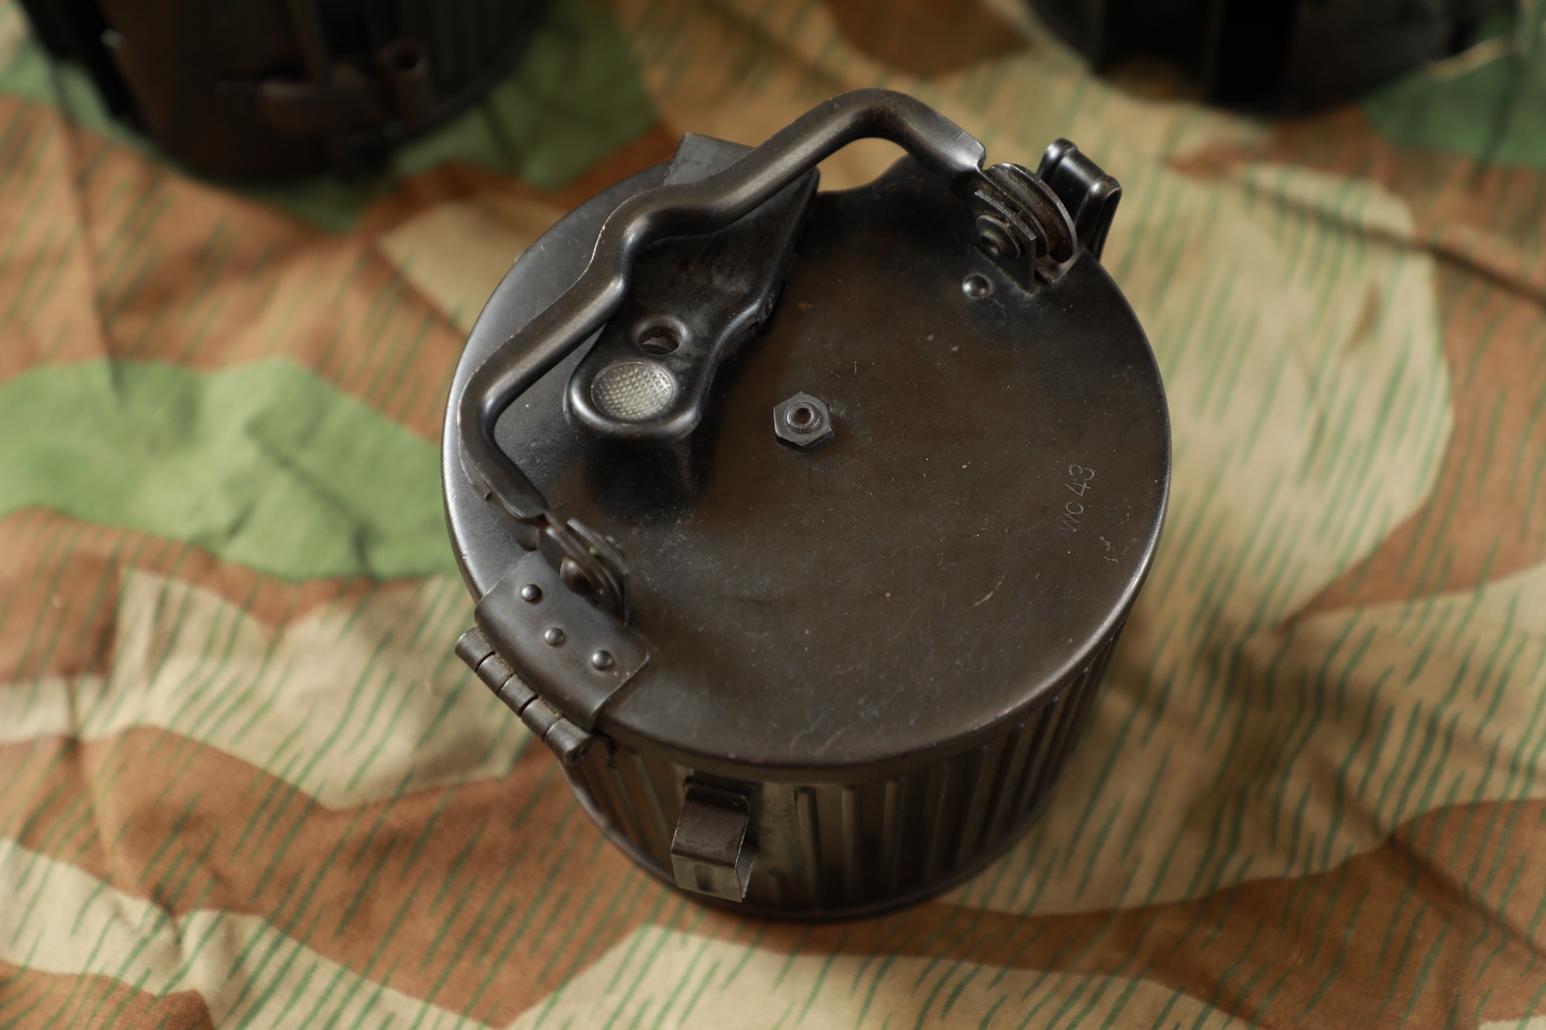 Складской кекс MG 34/42 wc 43